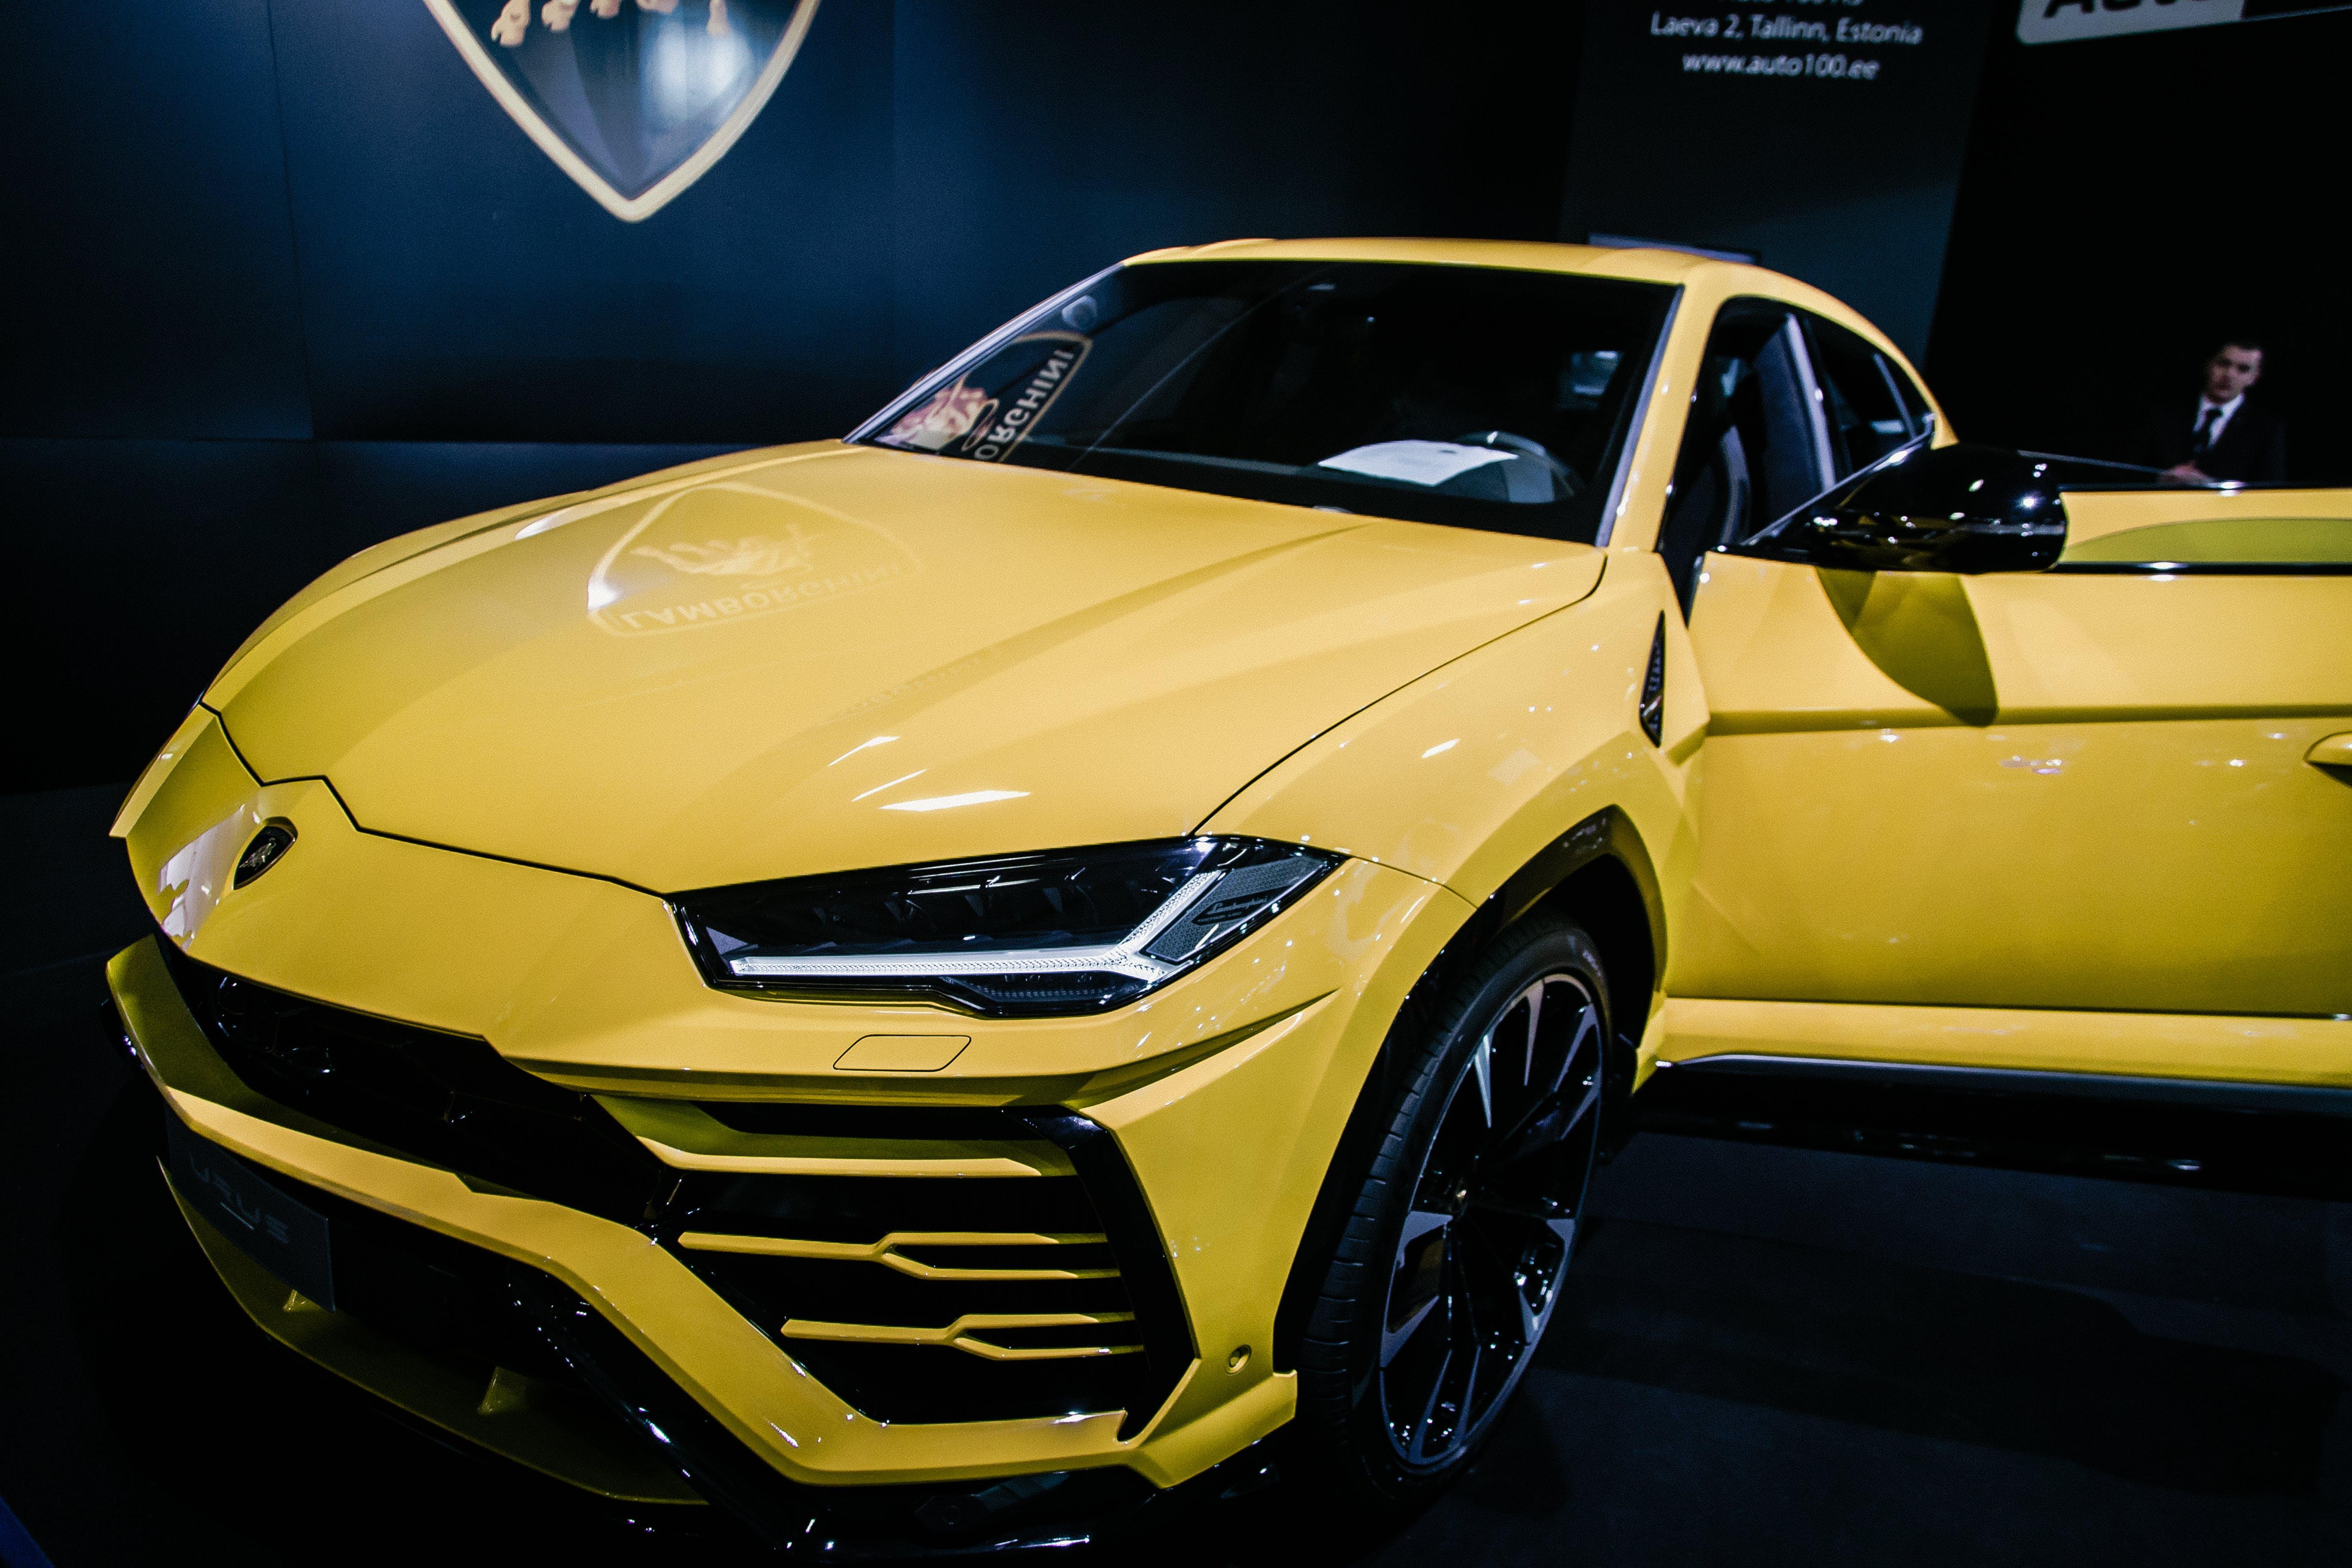 Yellow Luxury Car Near Man